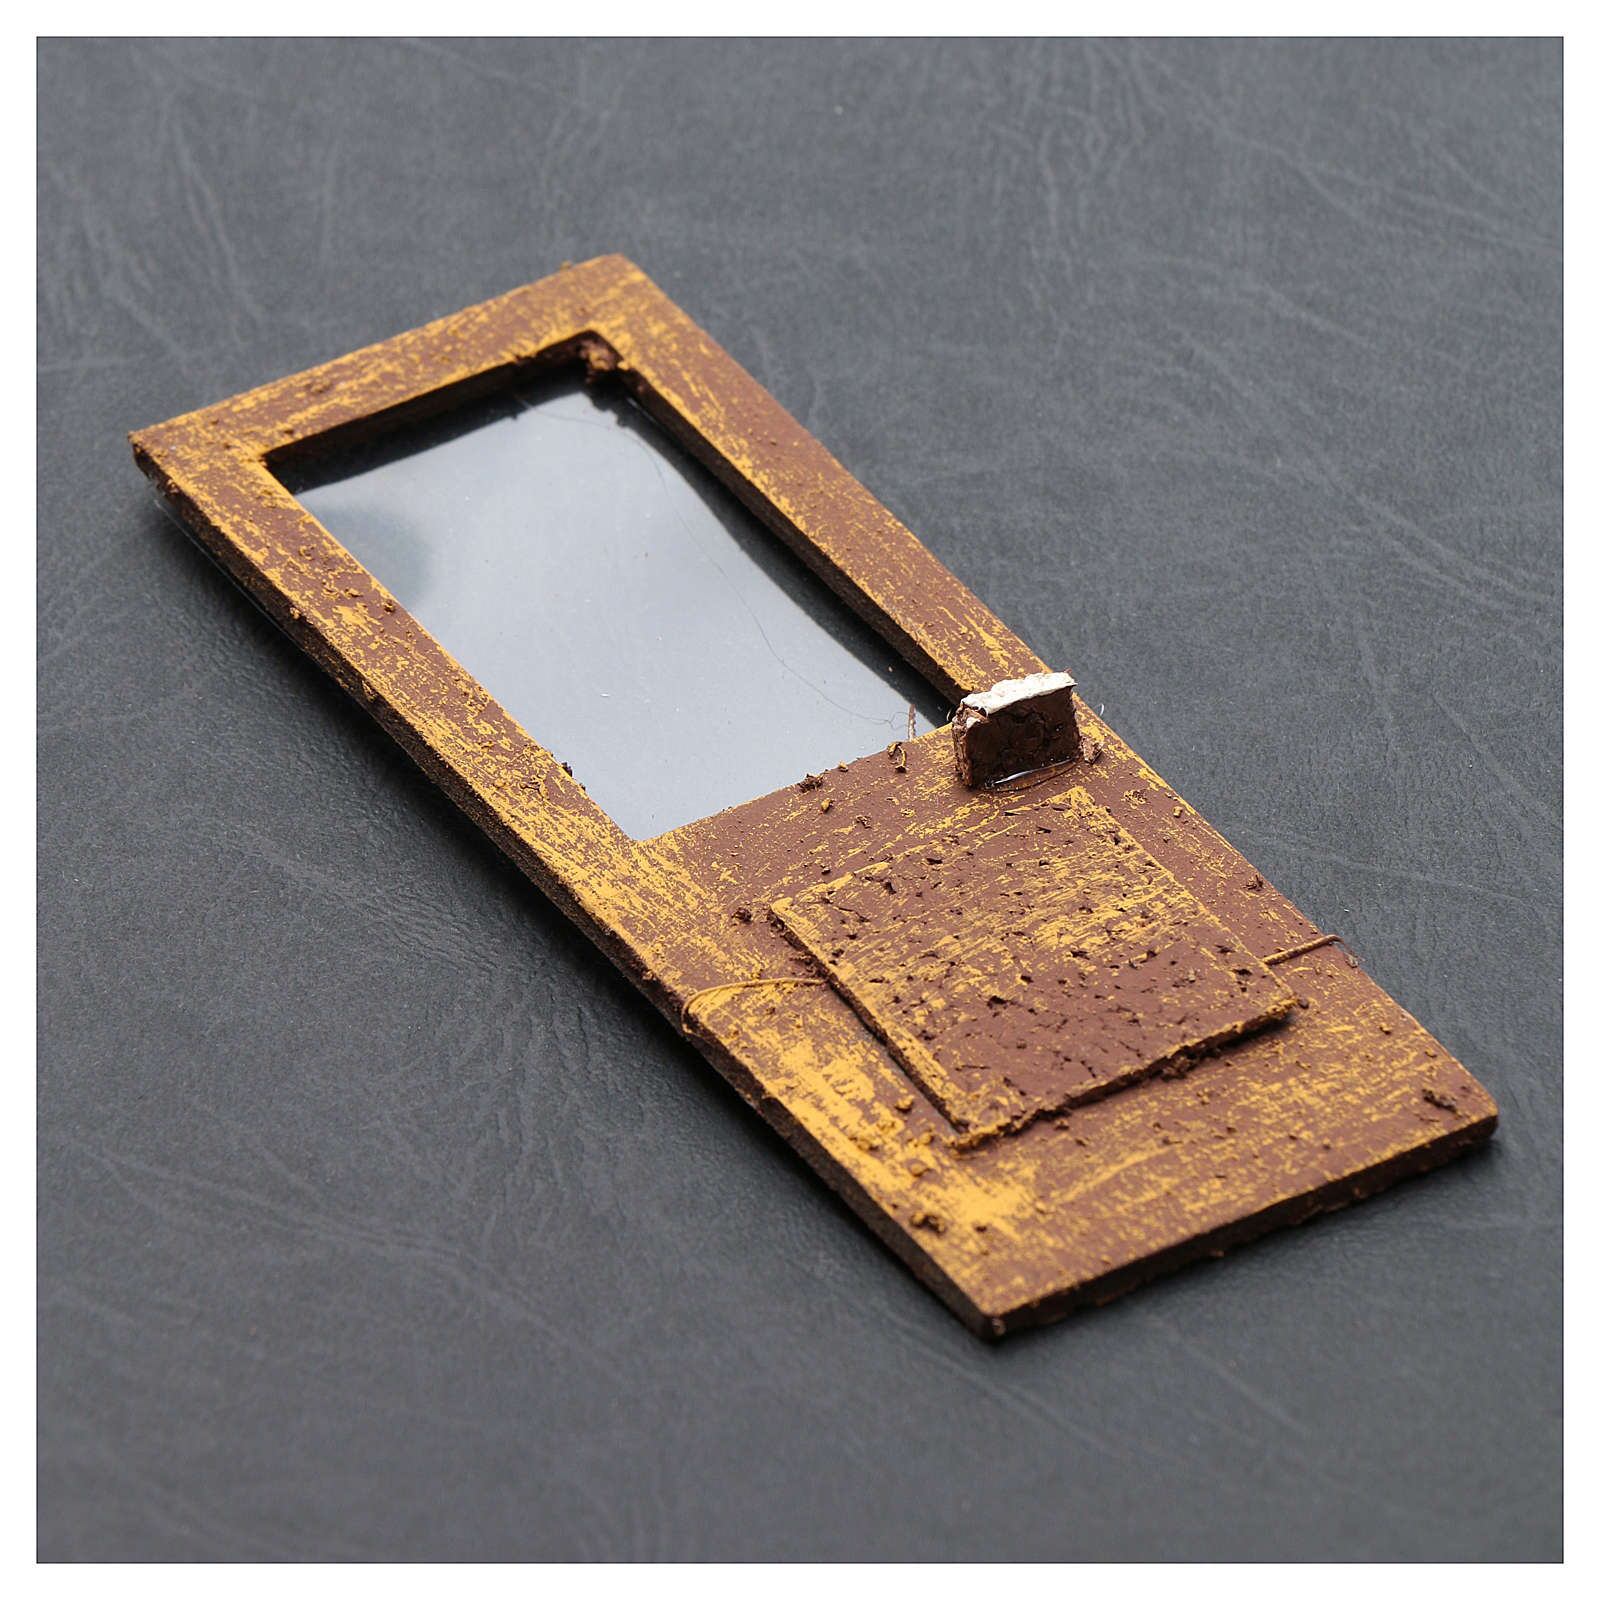 Porta per presepe 15x5 cm in legno 4